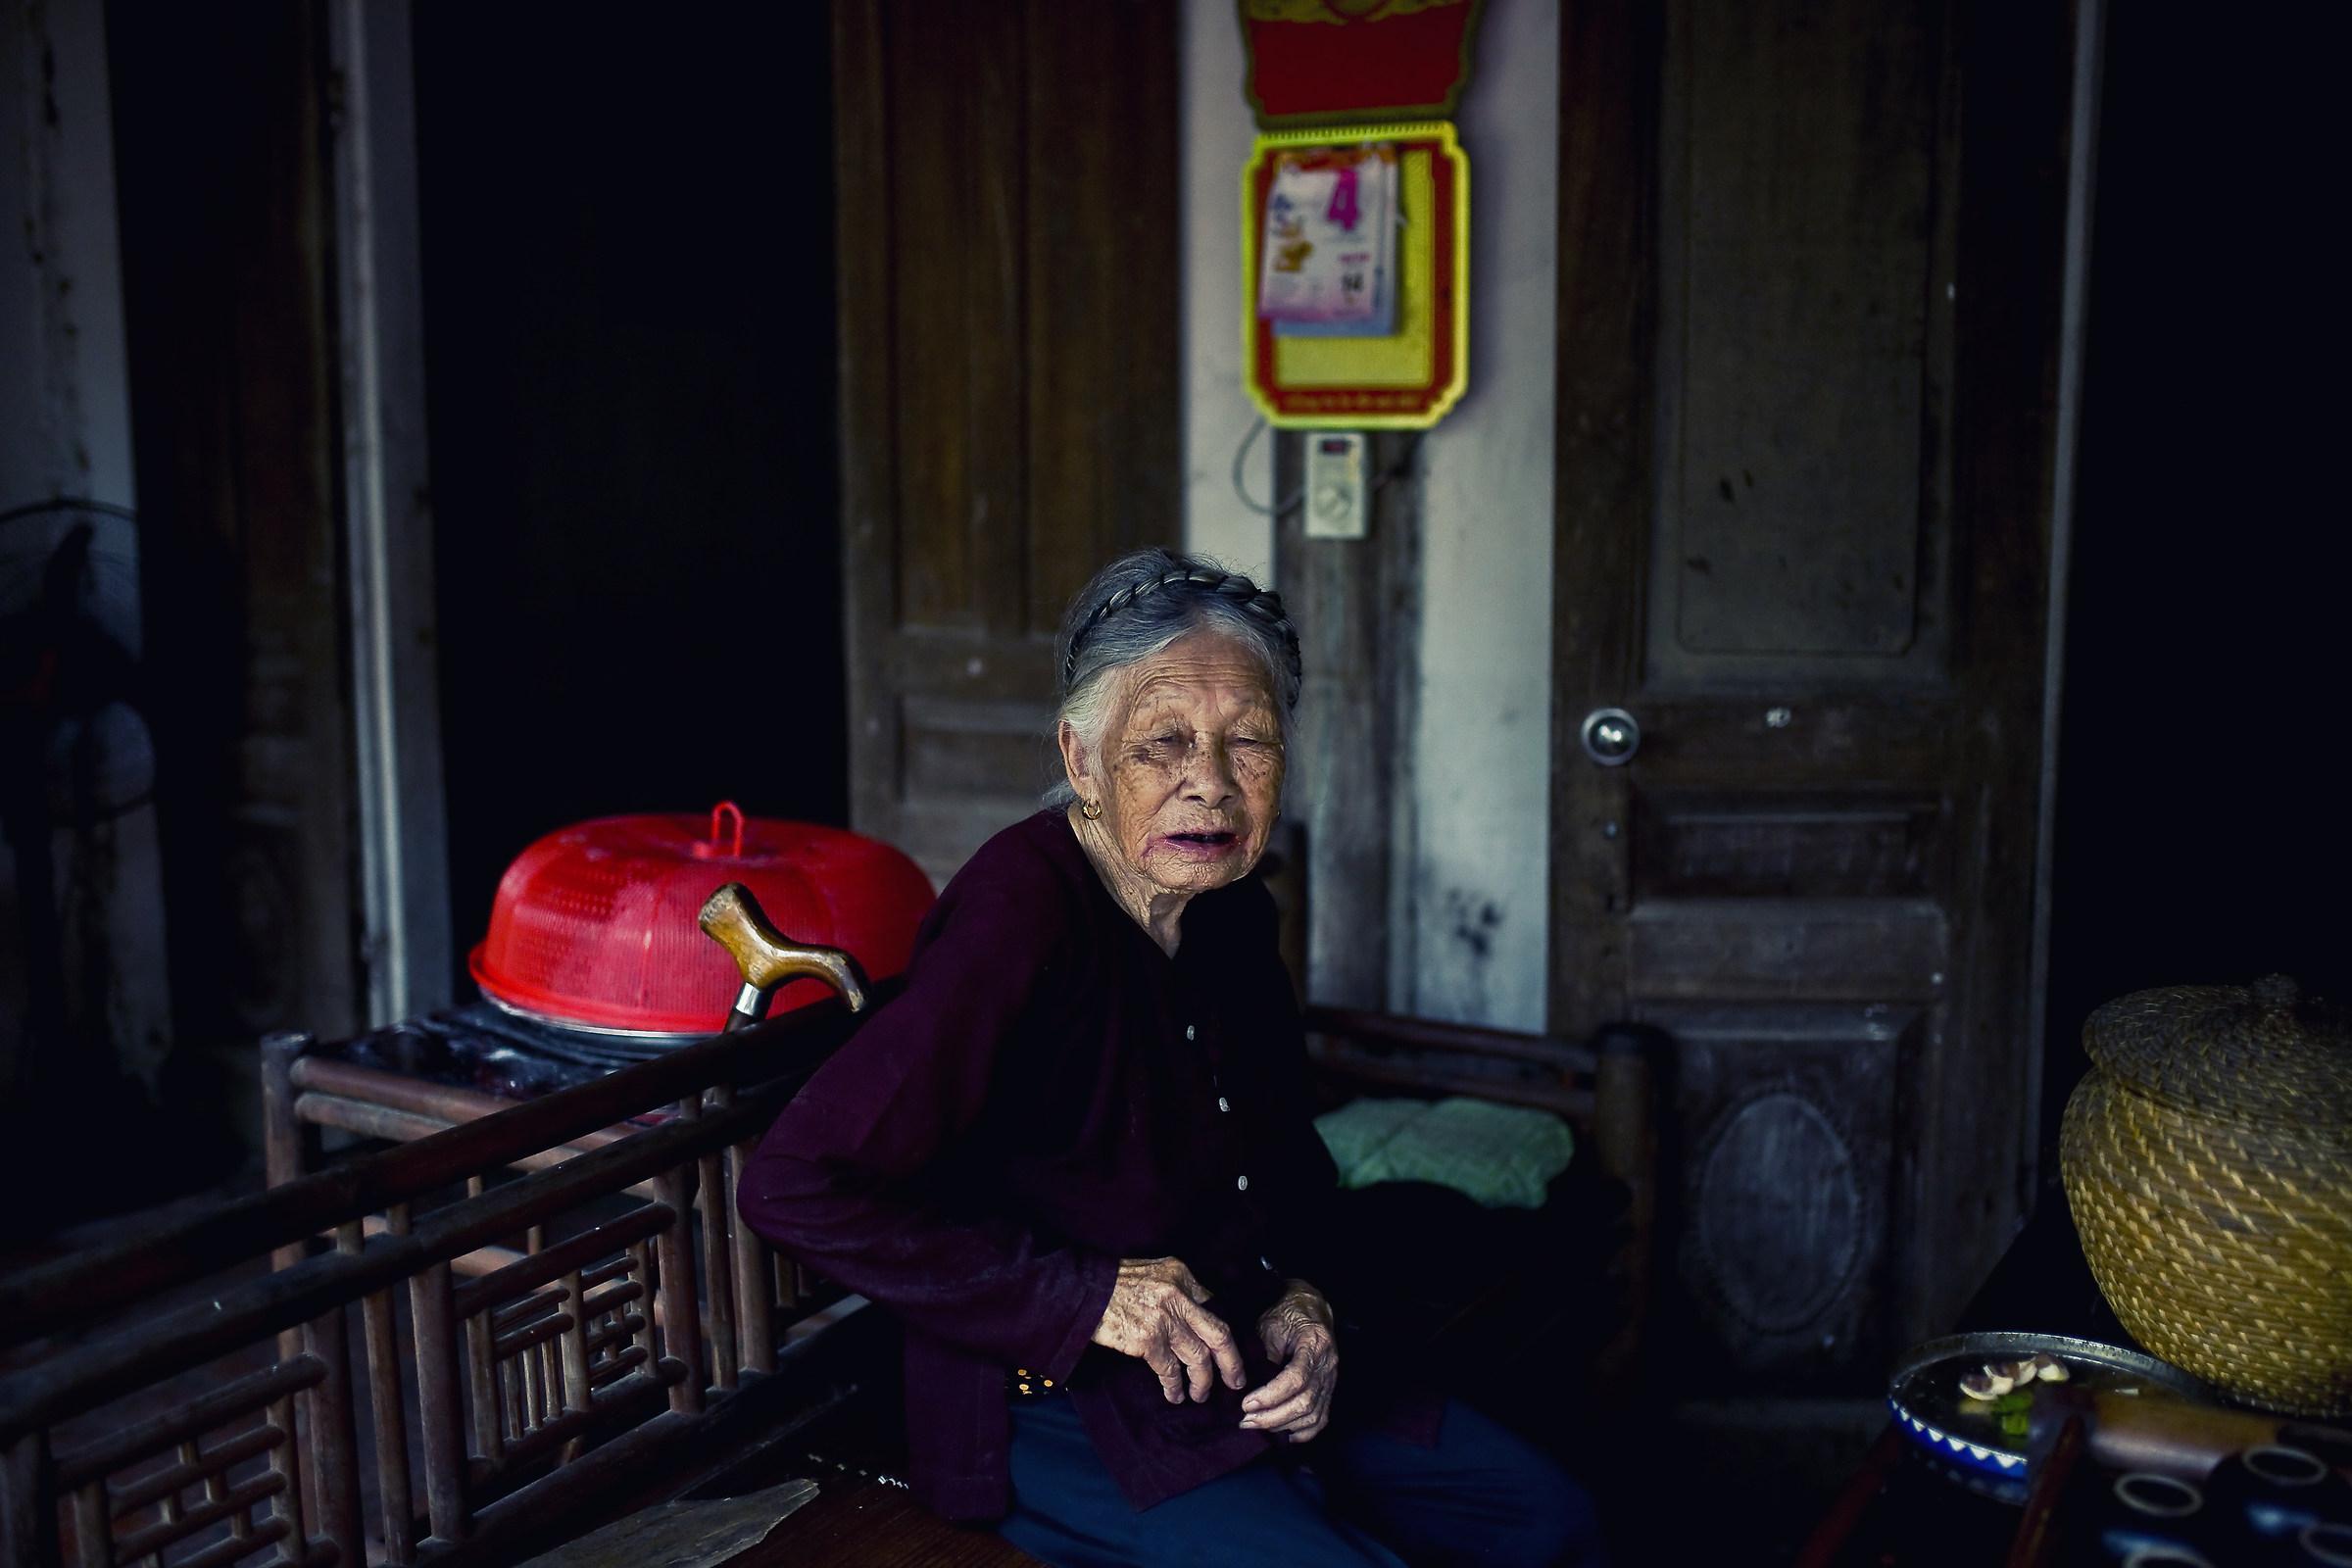 Grandma Taking Betel Drugs On Her Old Wooden Sofa...